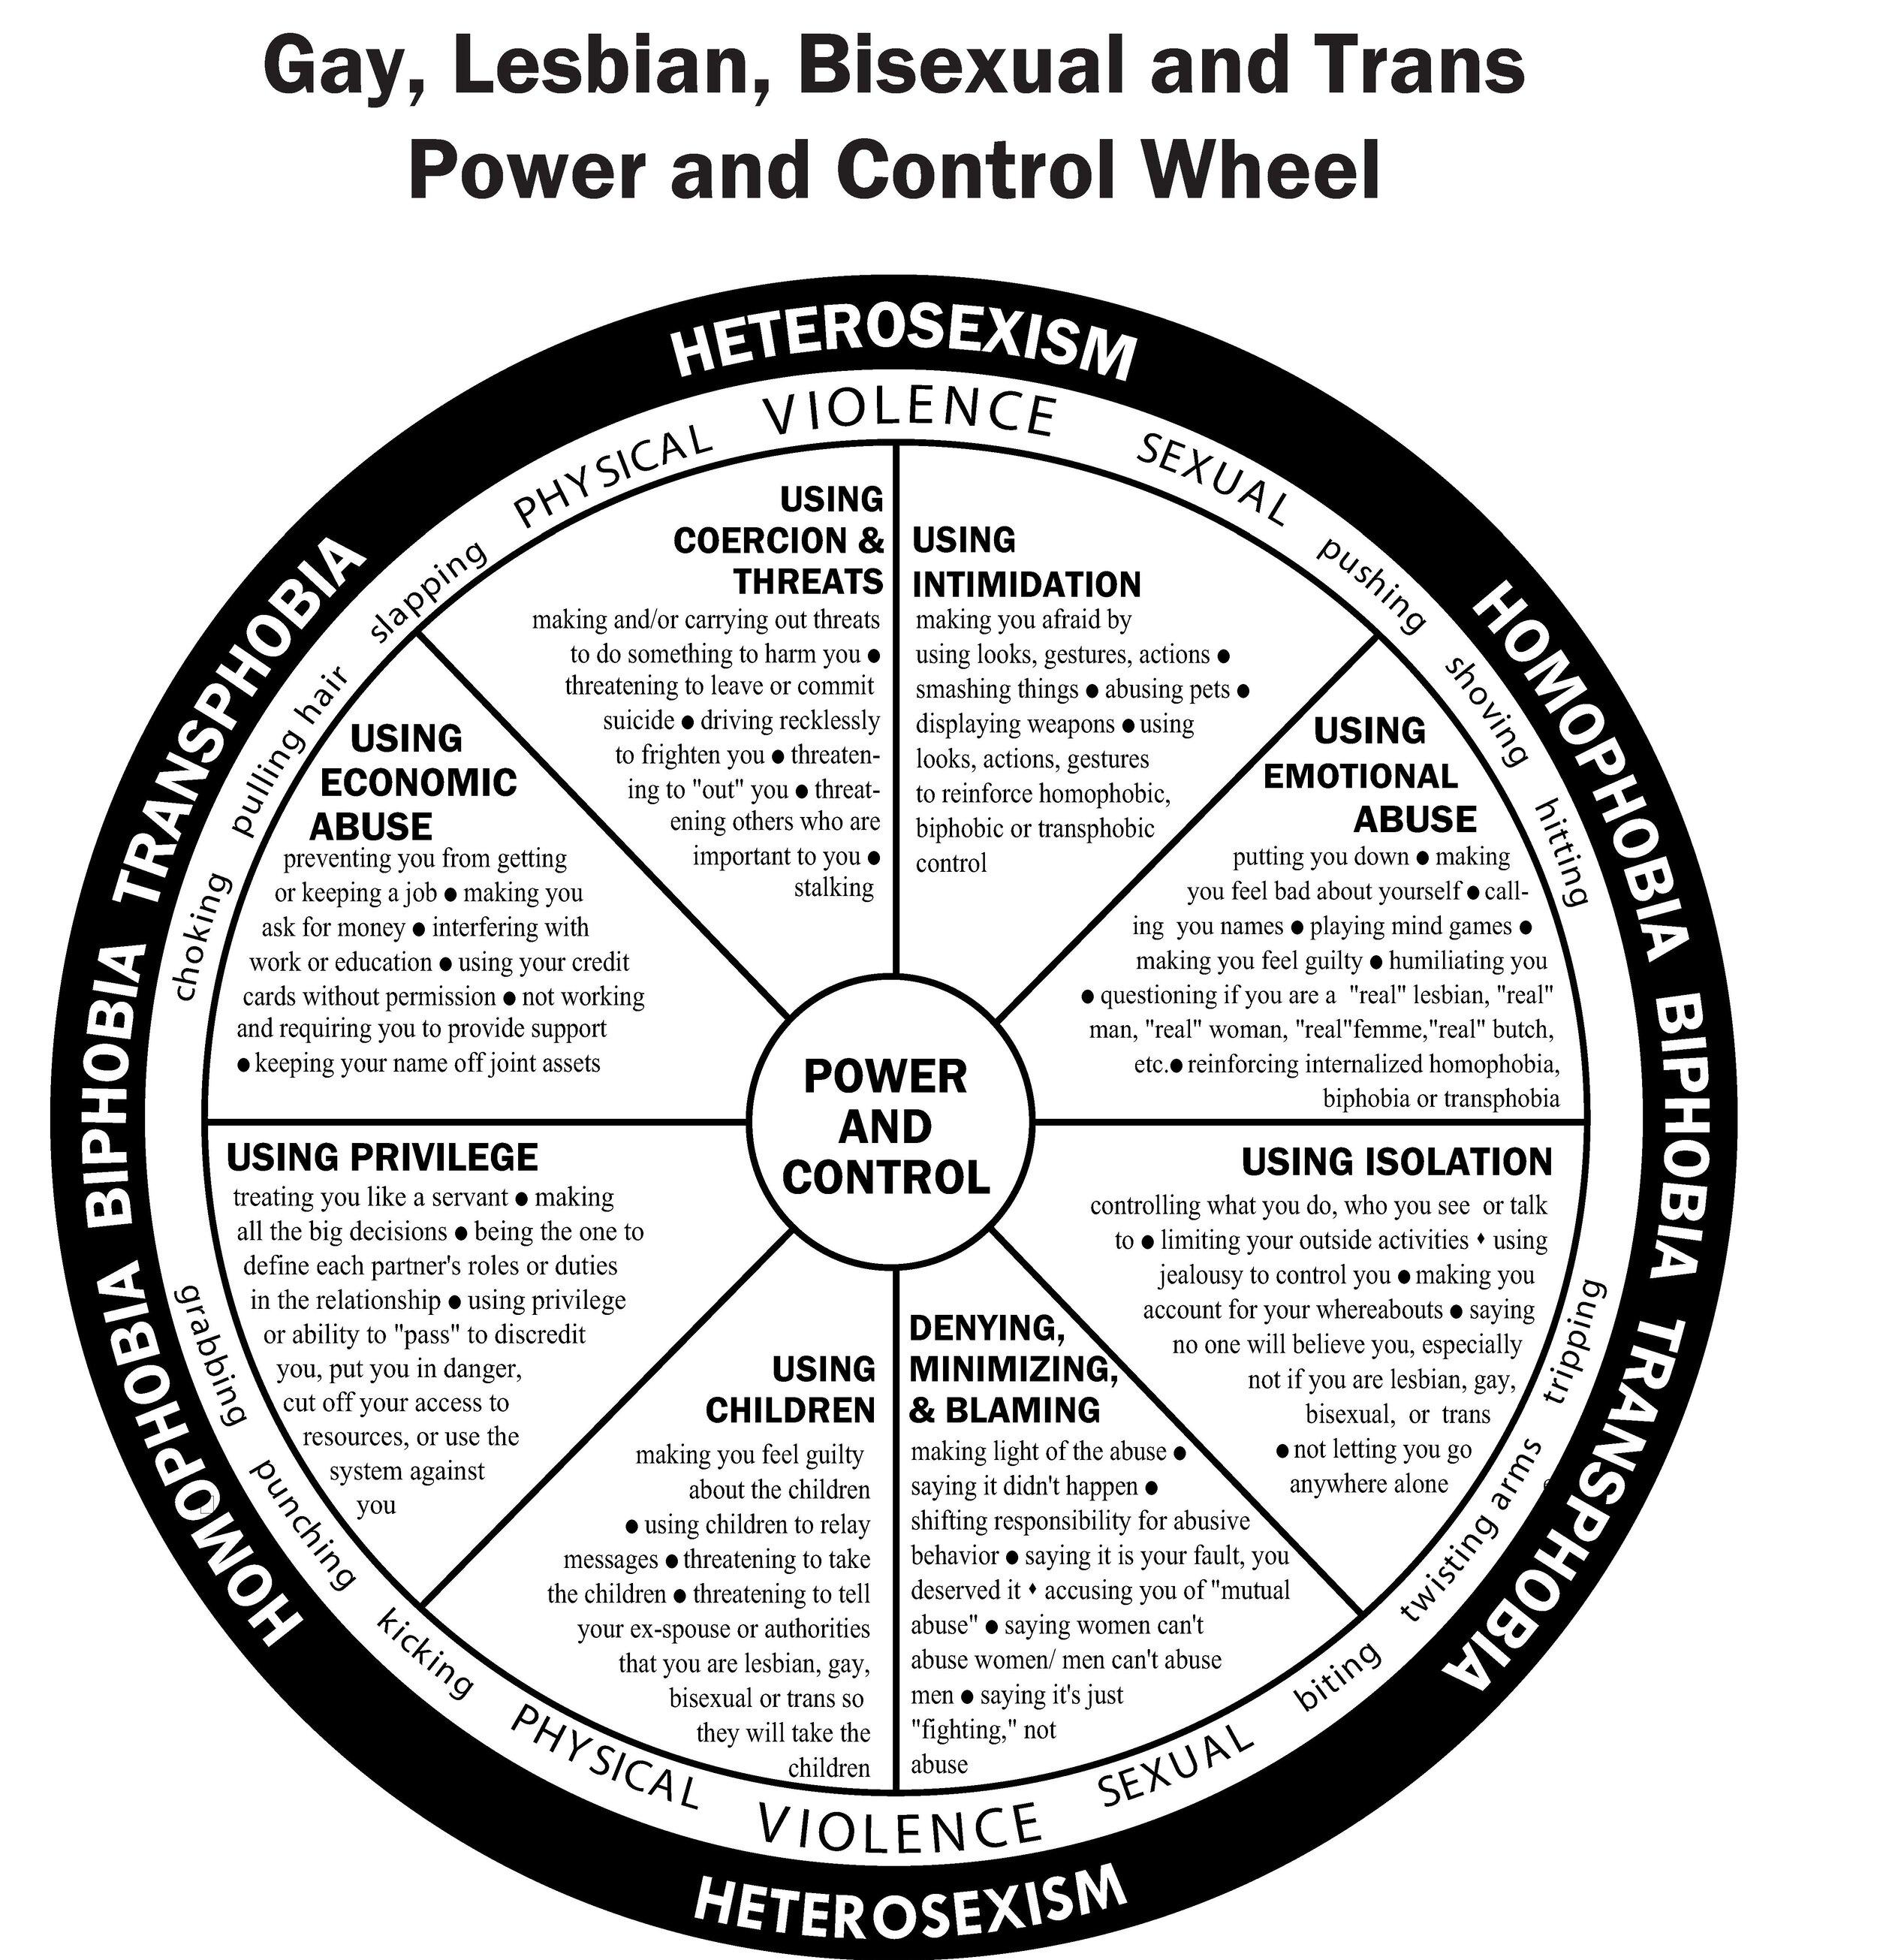 TCFV_glbt_wheel.jpg